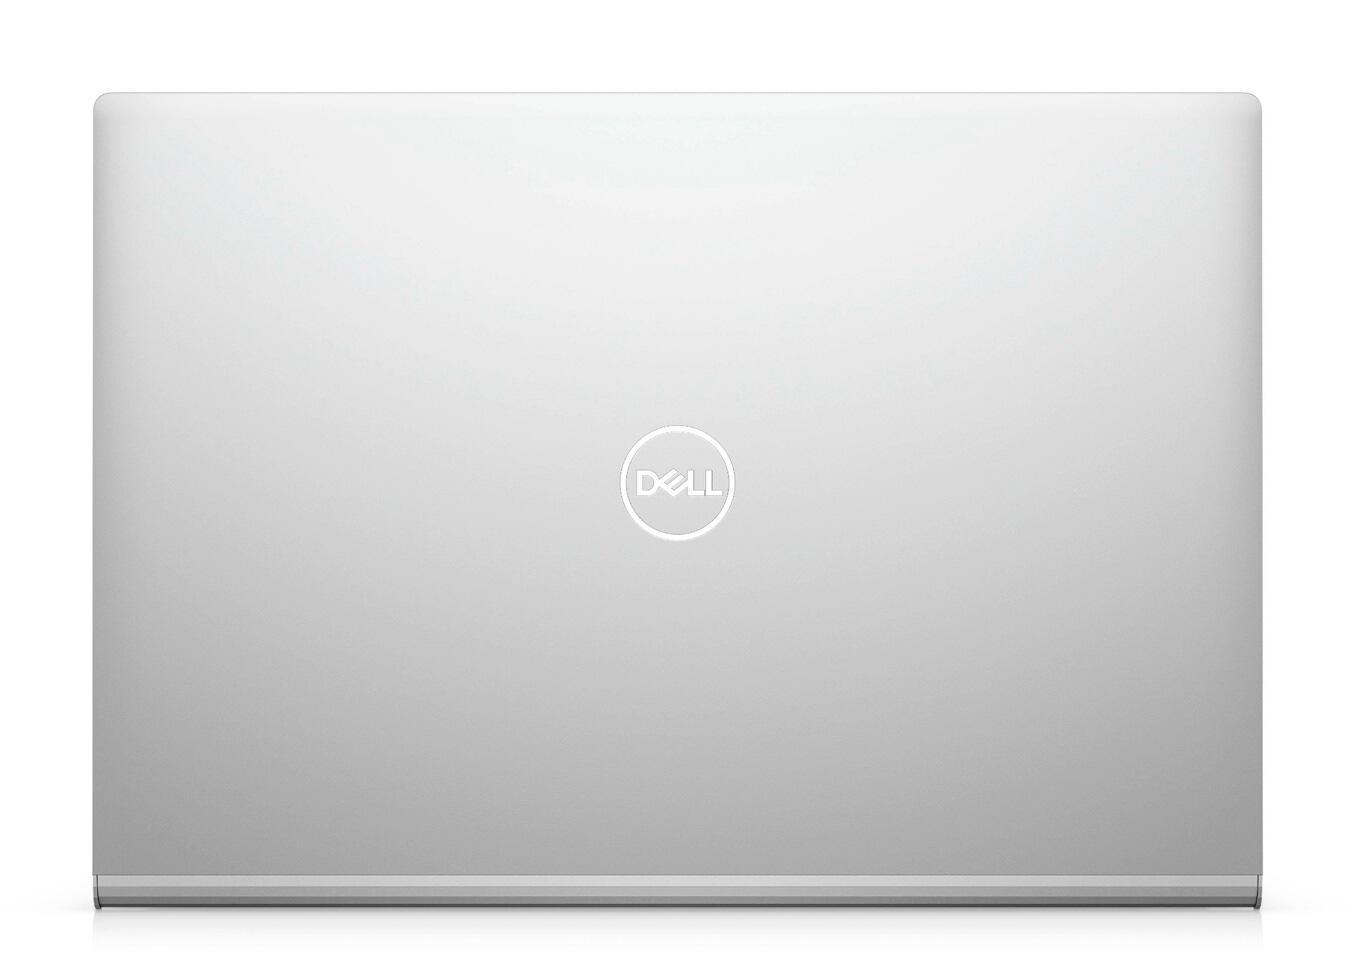 Ordinateur portable Dell Inspiron 14 7400 Argent - QHD+, MX350, Core i7  - photo 5